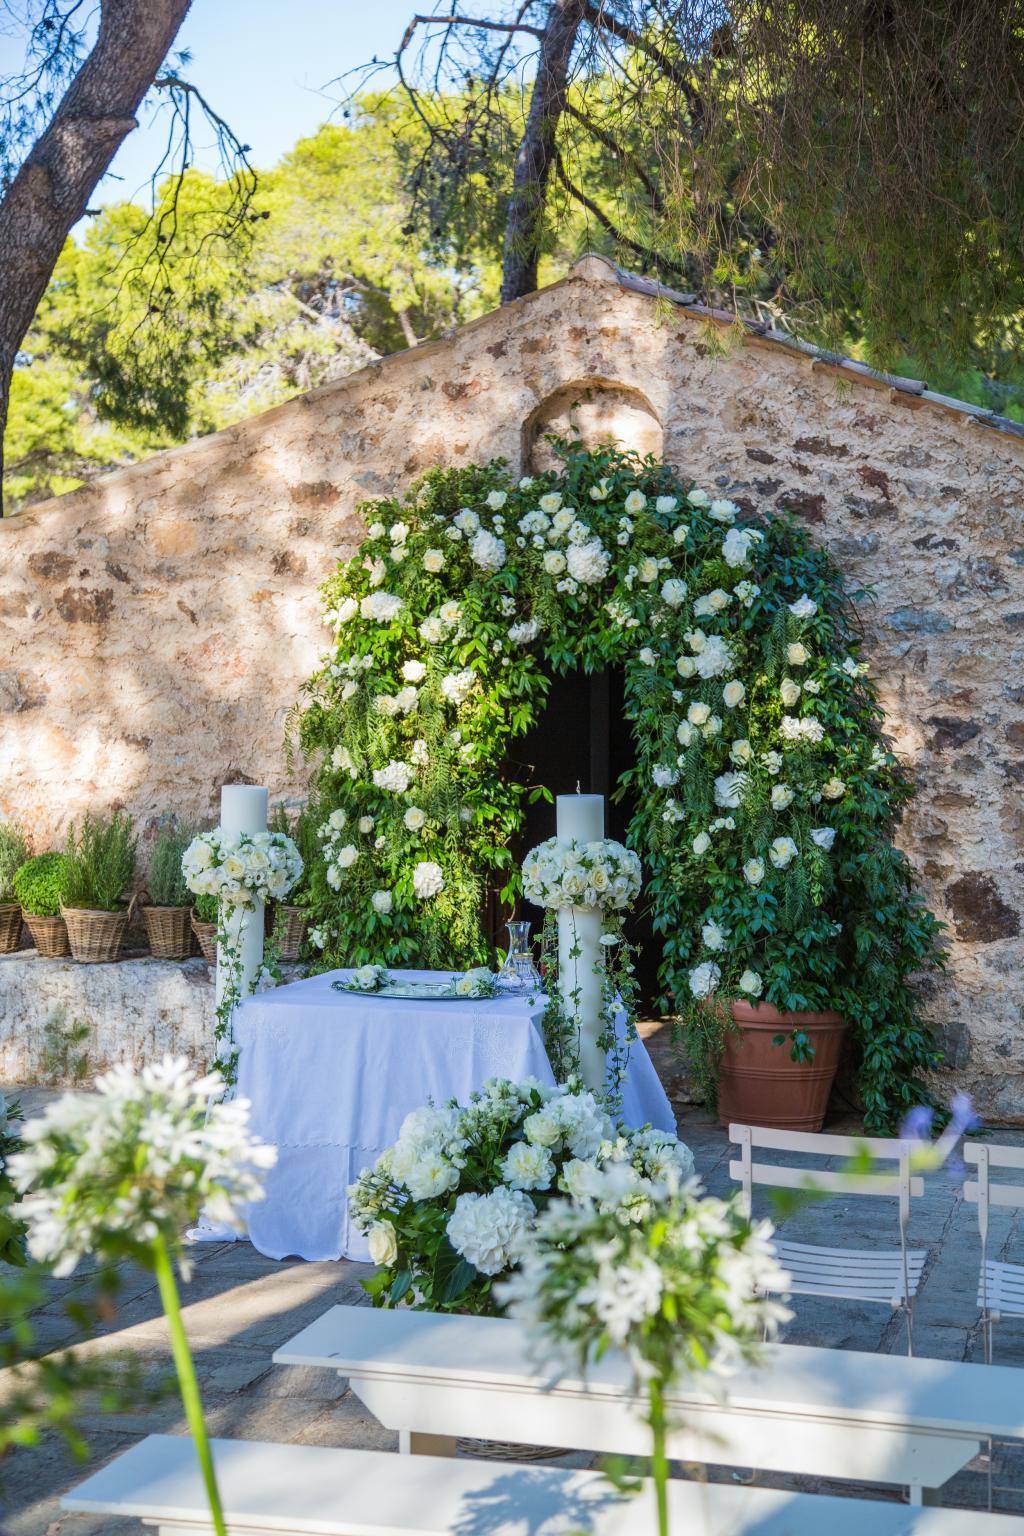 P&N Sinterina wedding - Image 3